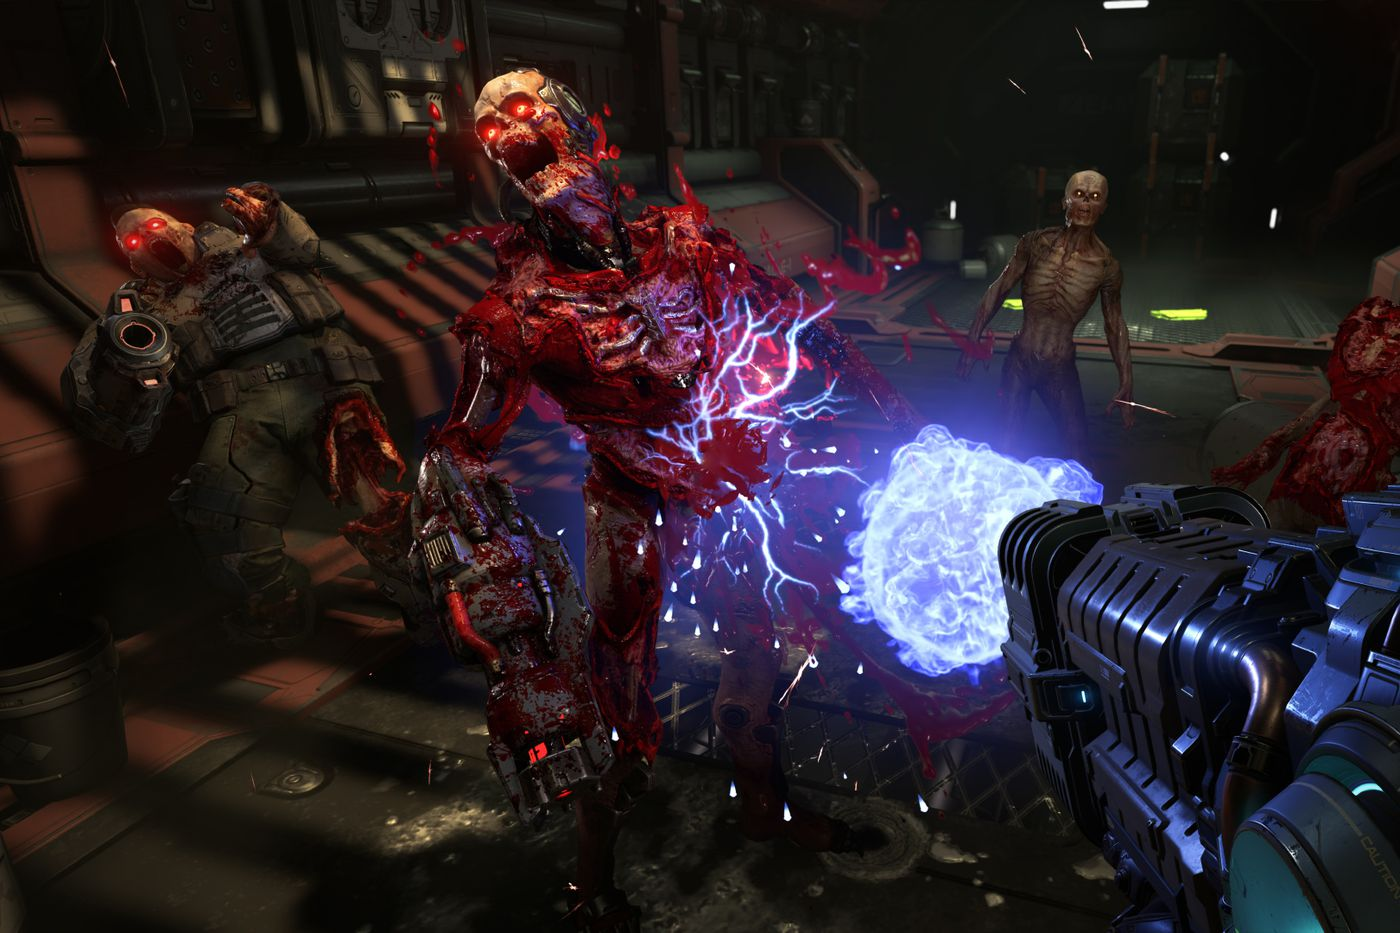 Doom Eternal Empowered Demons May Update Coming Soon Polygon